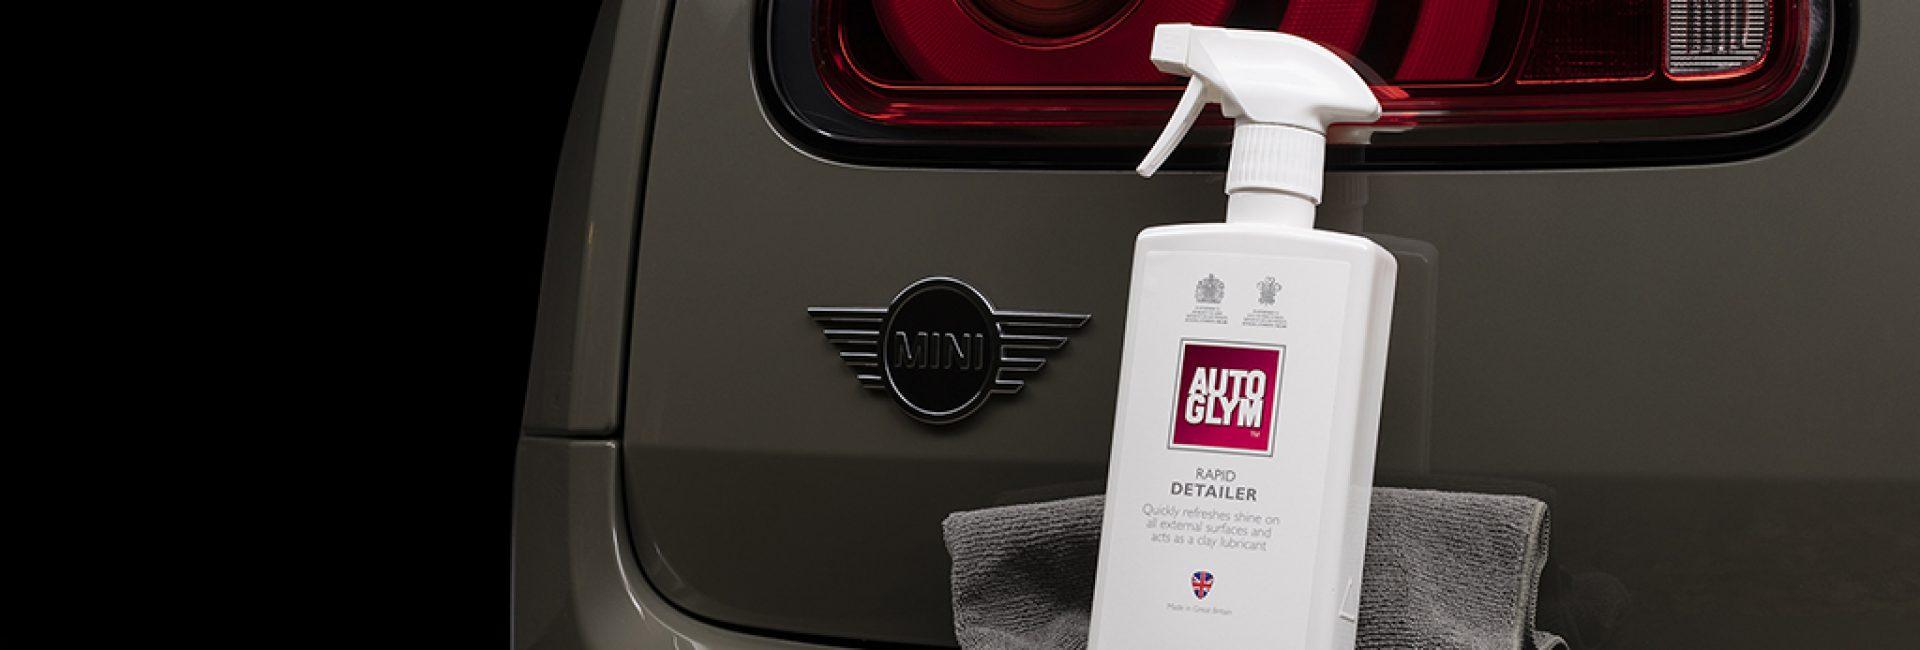 Cleaning cars in-between shooting is now easier